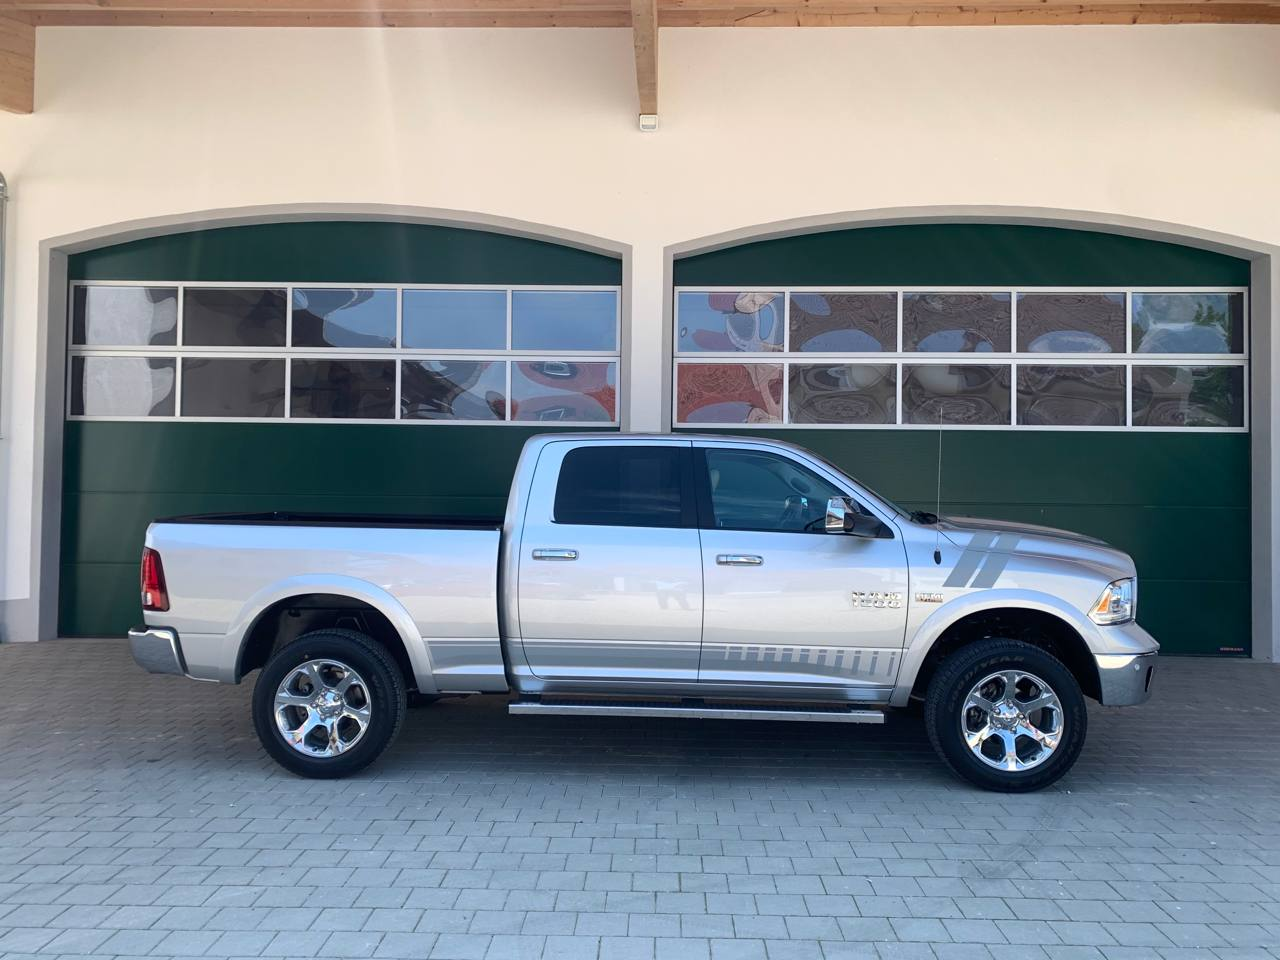 2017 Dodge Ram Laramie zu verkaufen